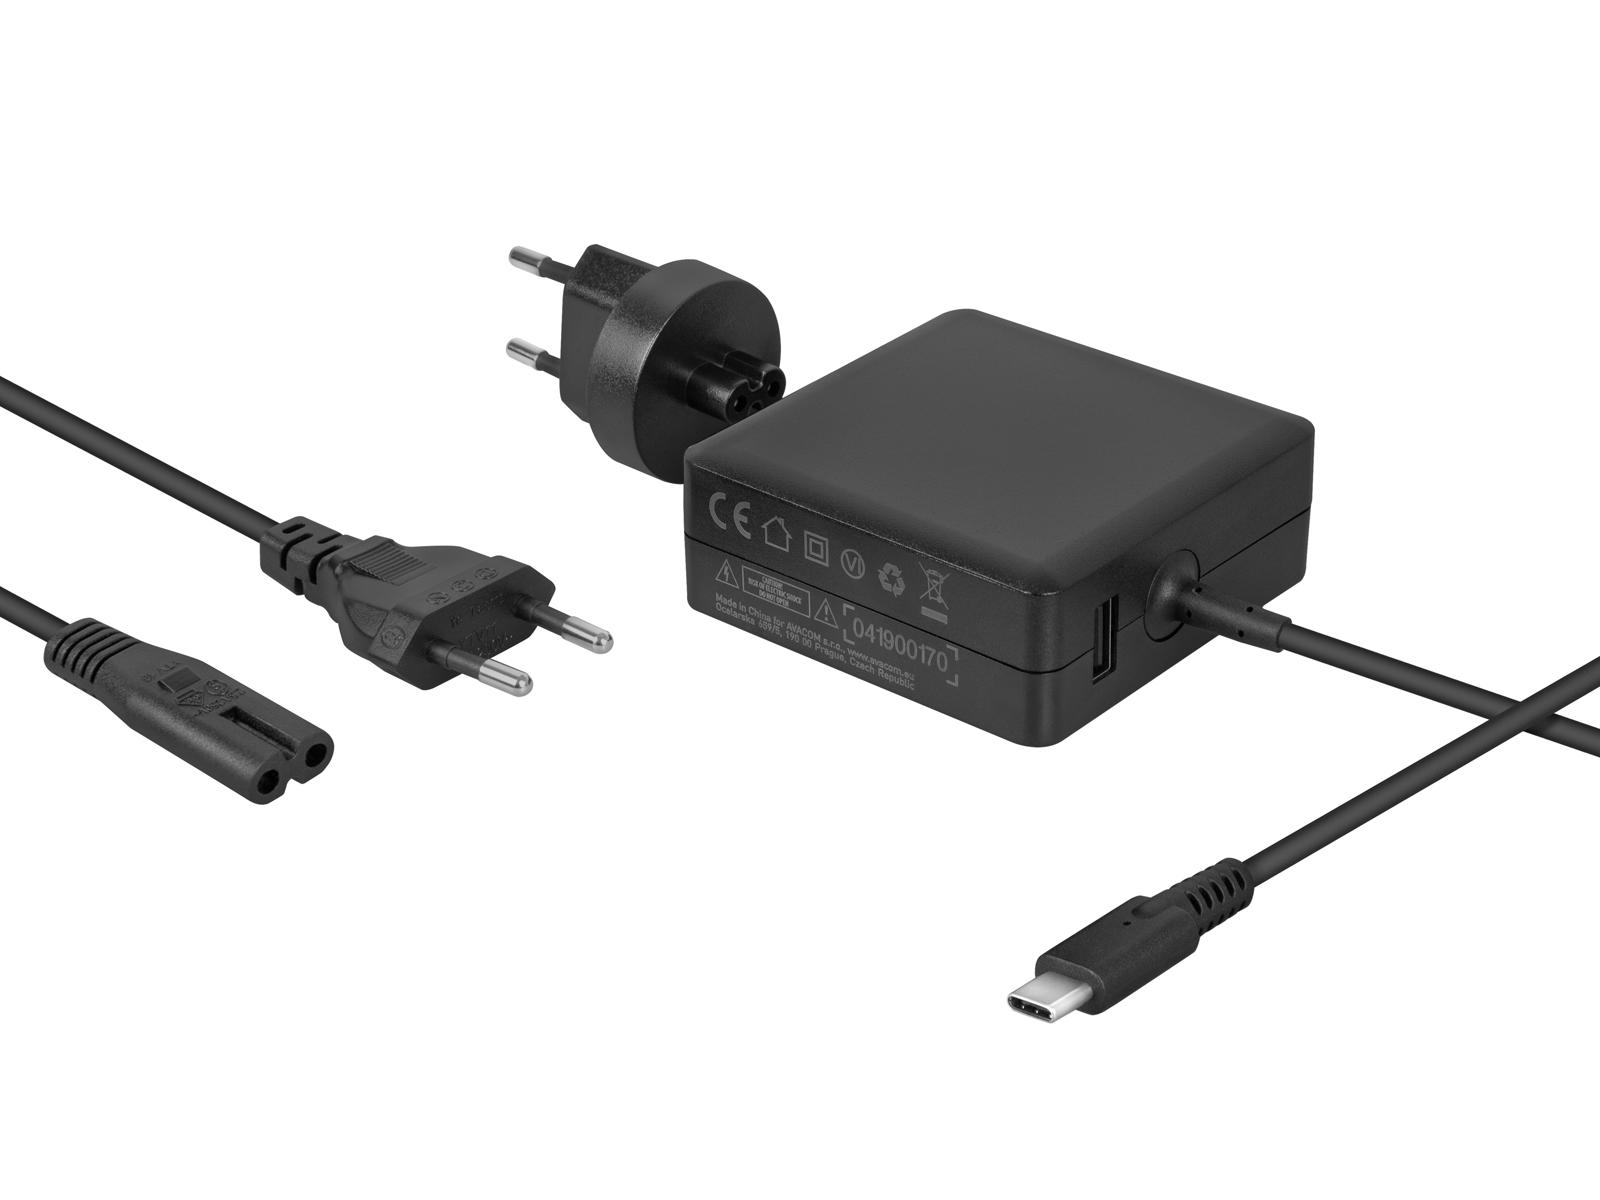 AVACOM nabíjecí adaptér pro MacBooky s USB Type-C 65W + USB A